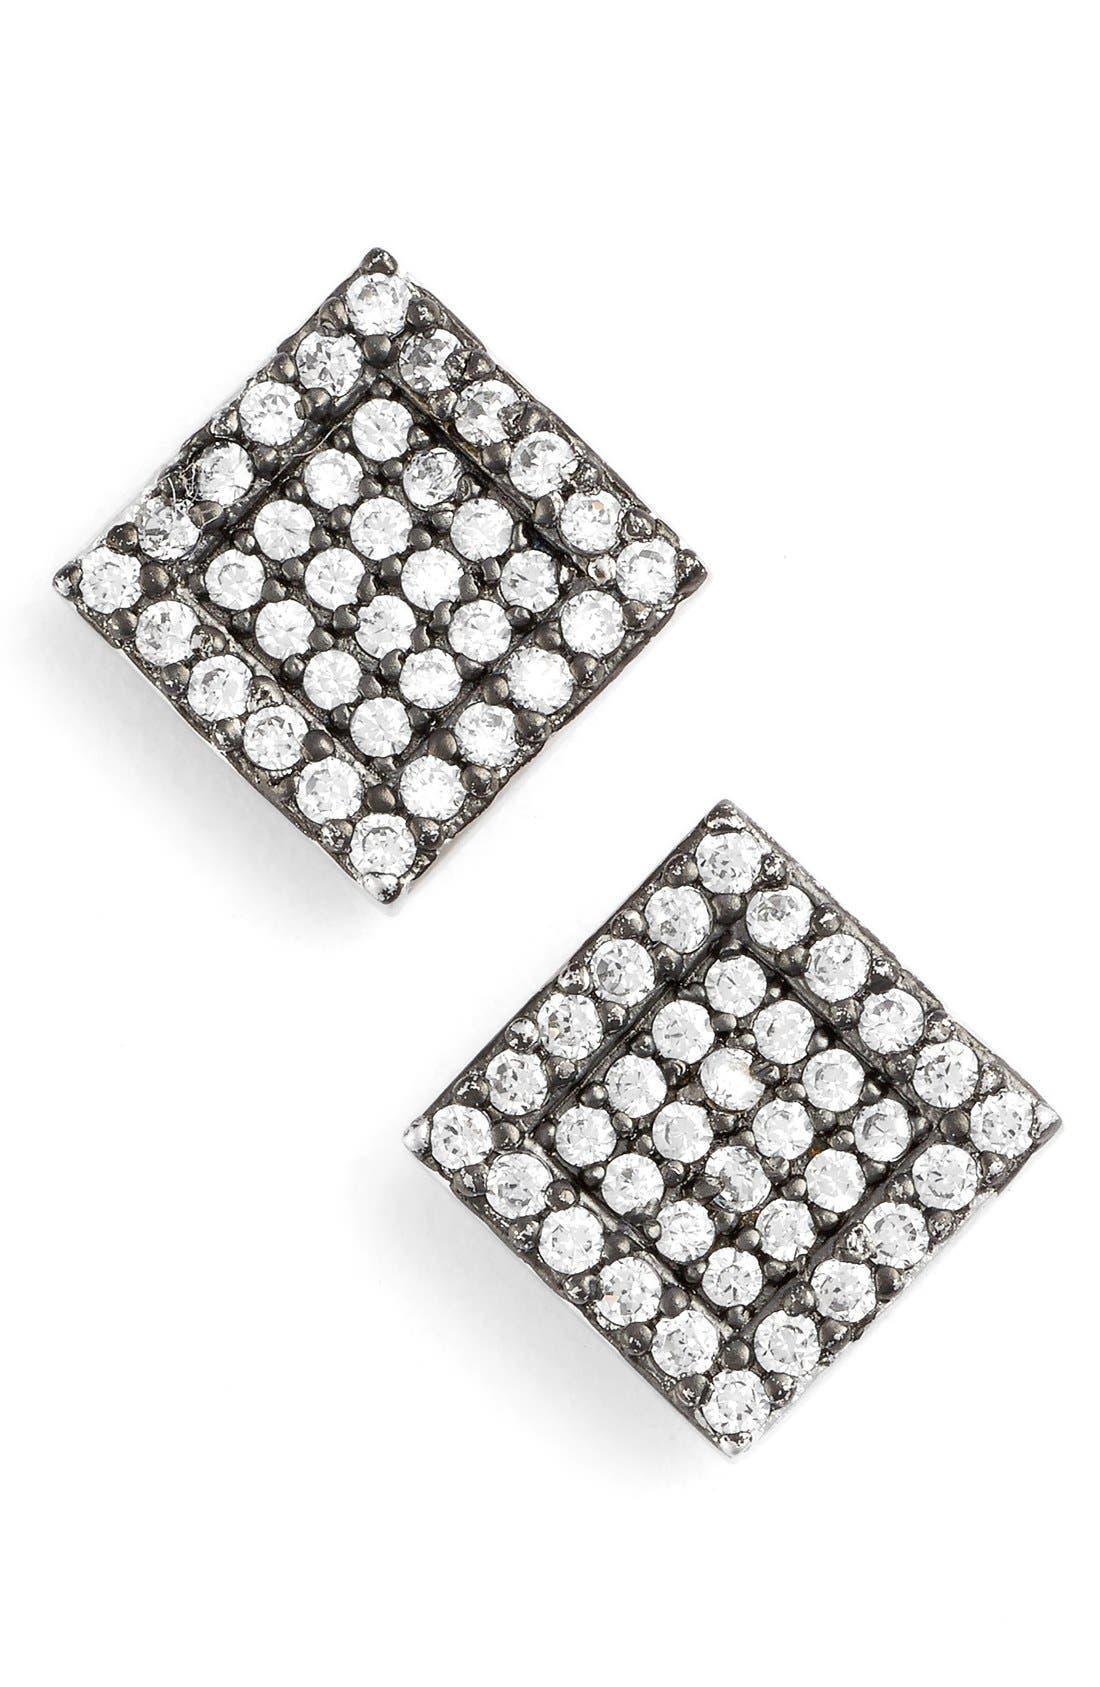 Alternate Image 1 Selected - FREIDA ROTHMAN 'Femme' Square Stud Earrings